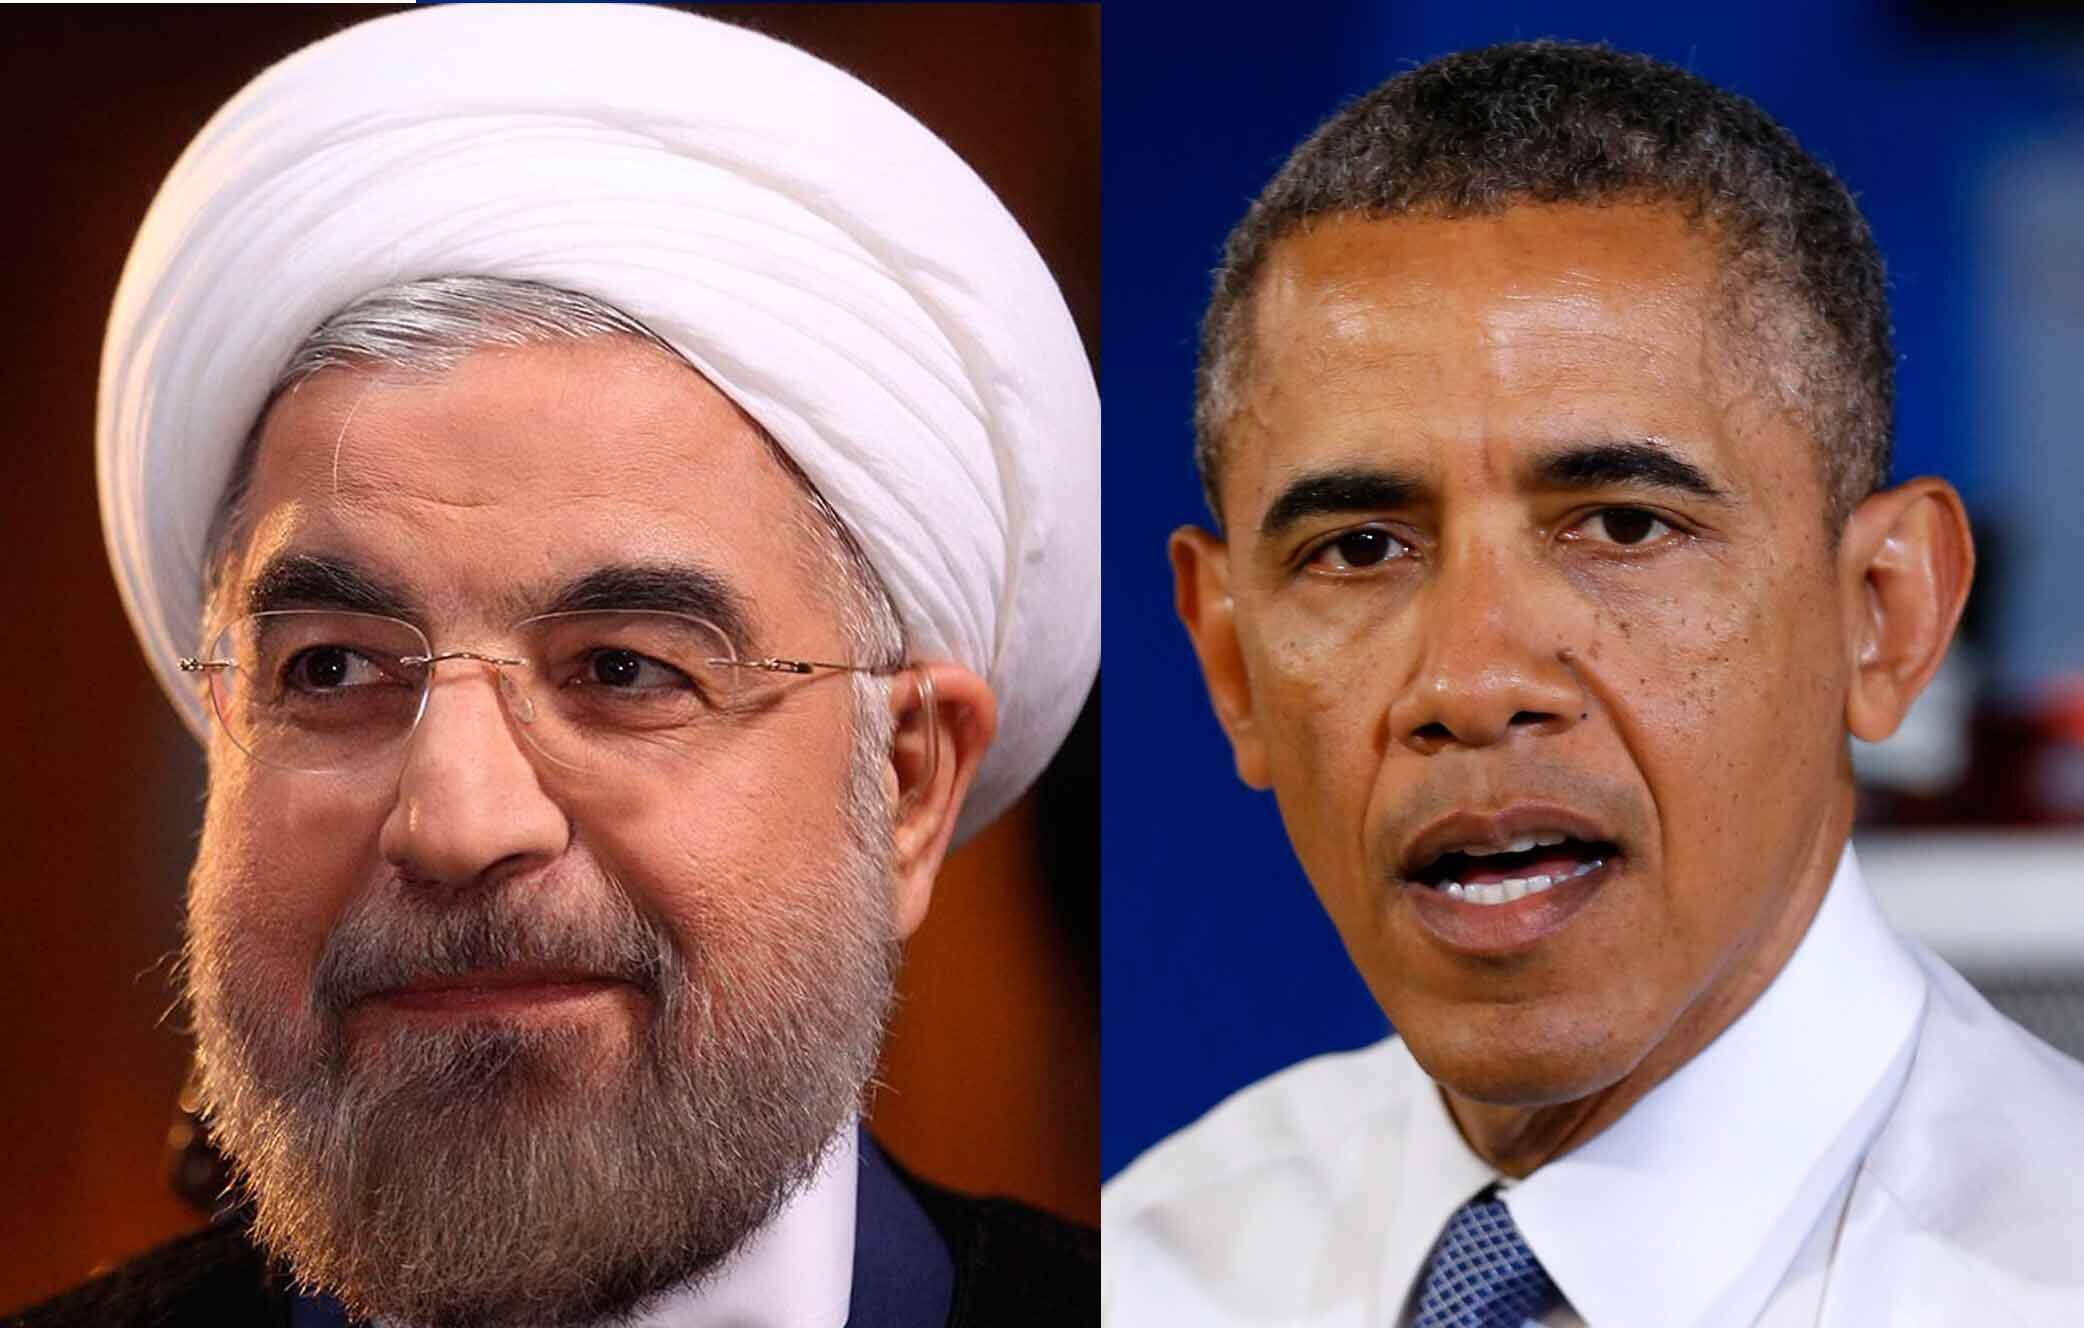 Les présidents Hassan Rohani et Barack Obama.